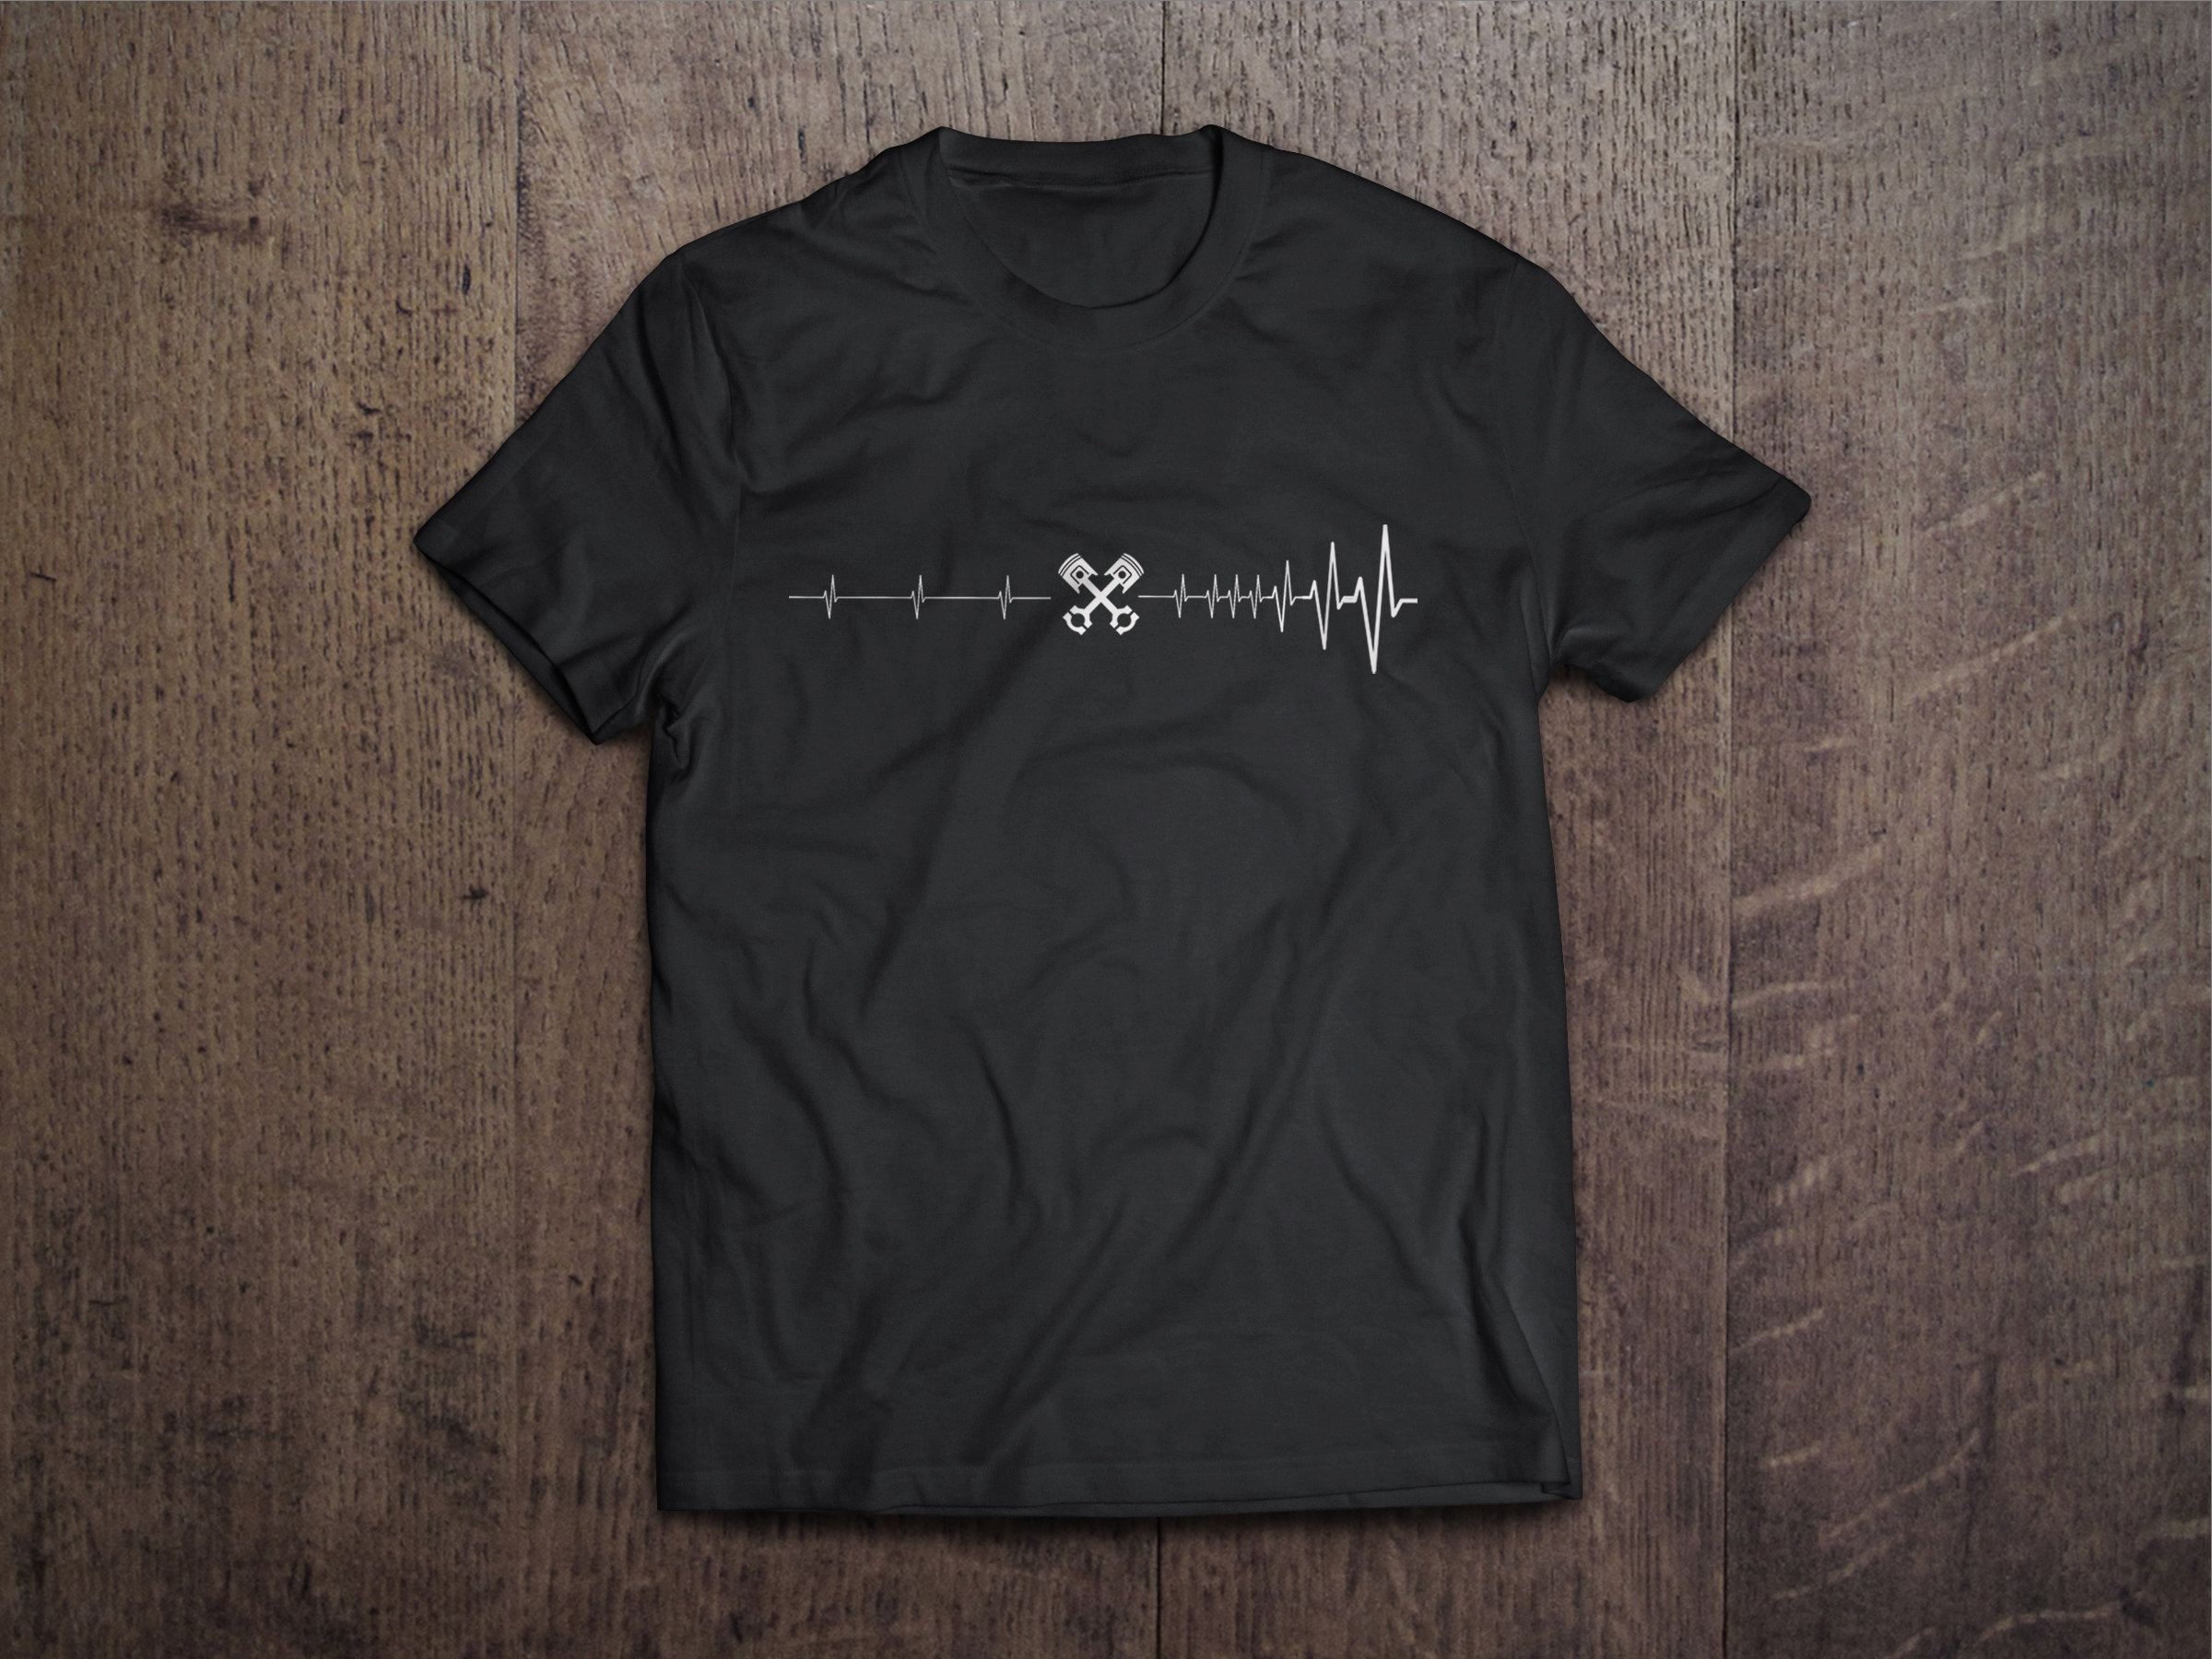 Petrolhead Heartbeat Chest Candy Heartbeat Petrolhead Tshirt